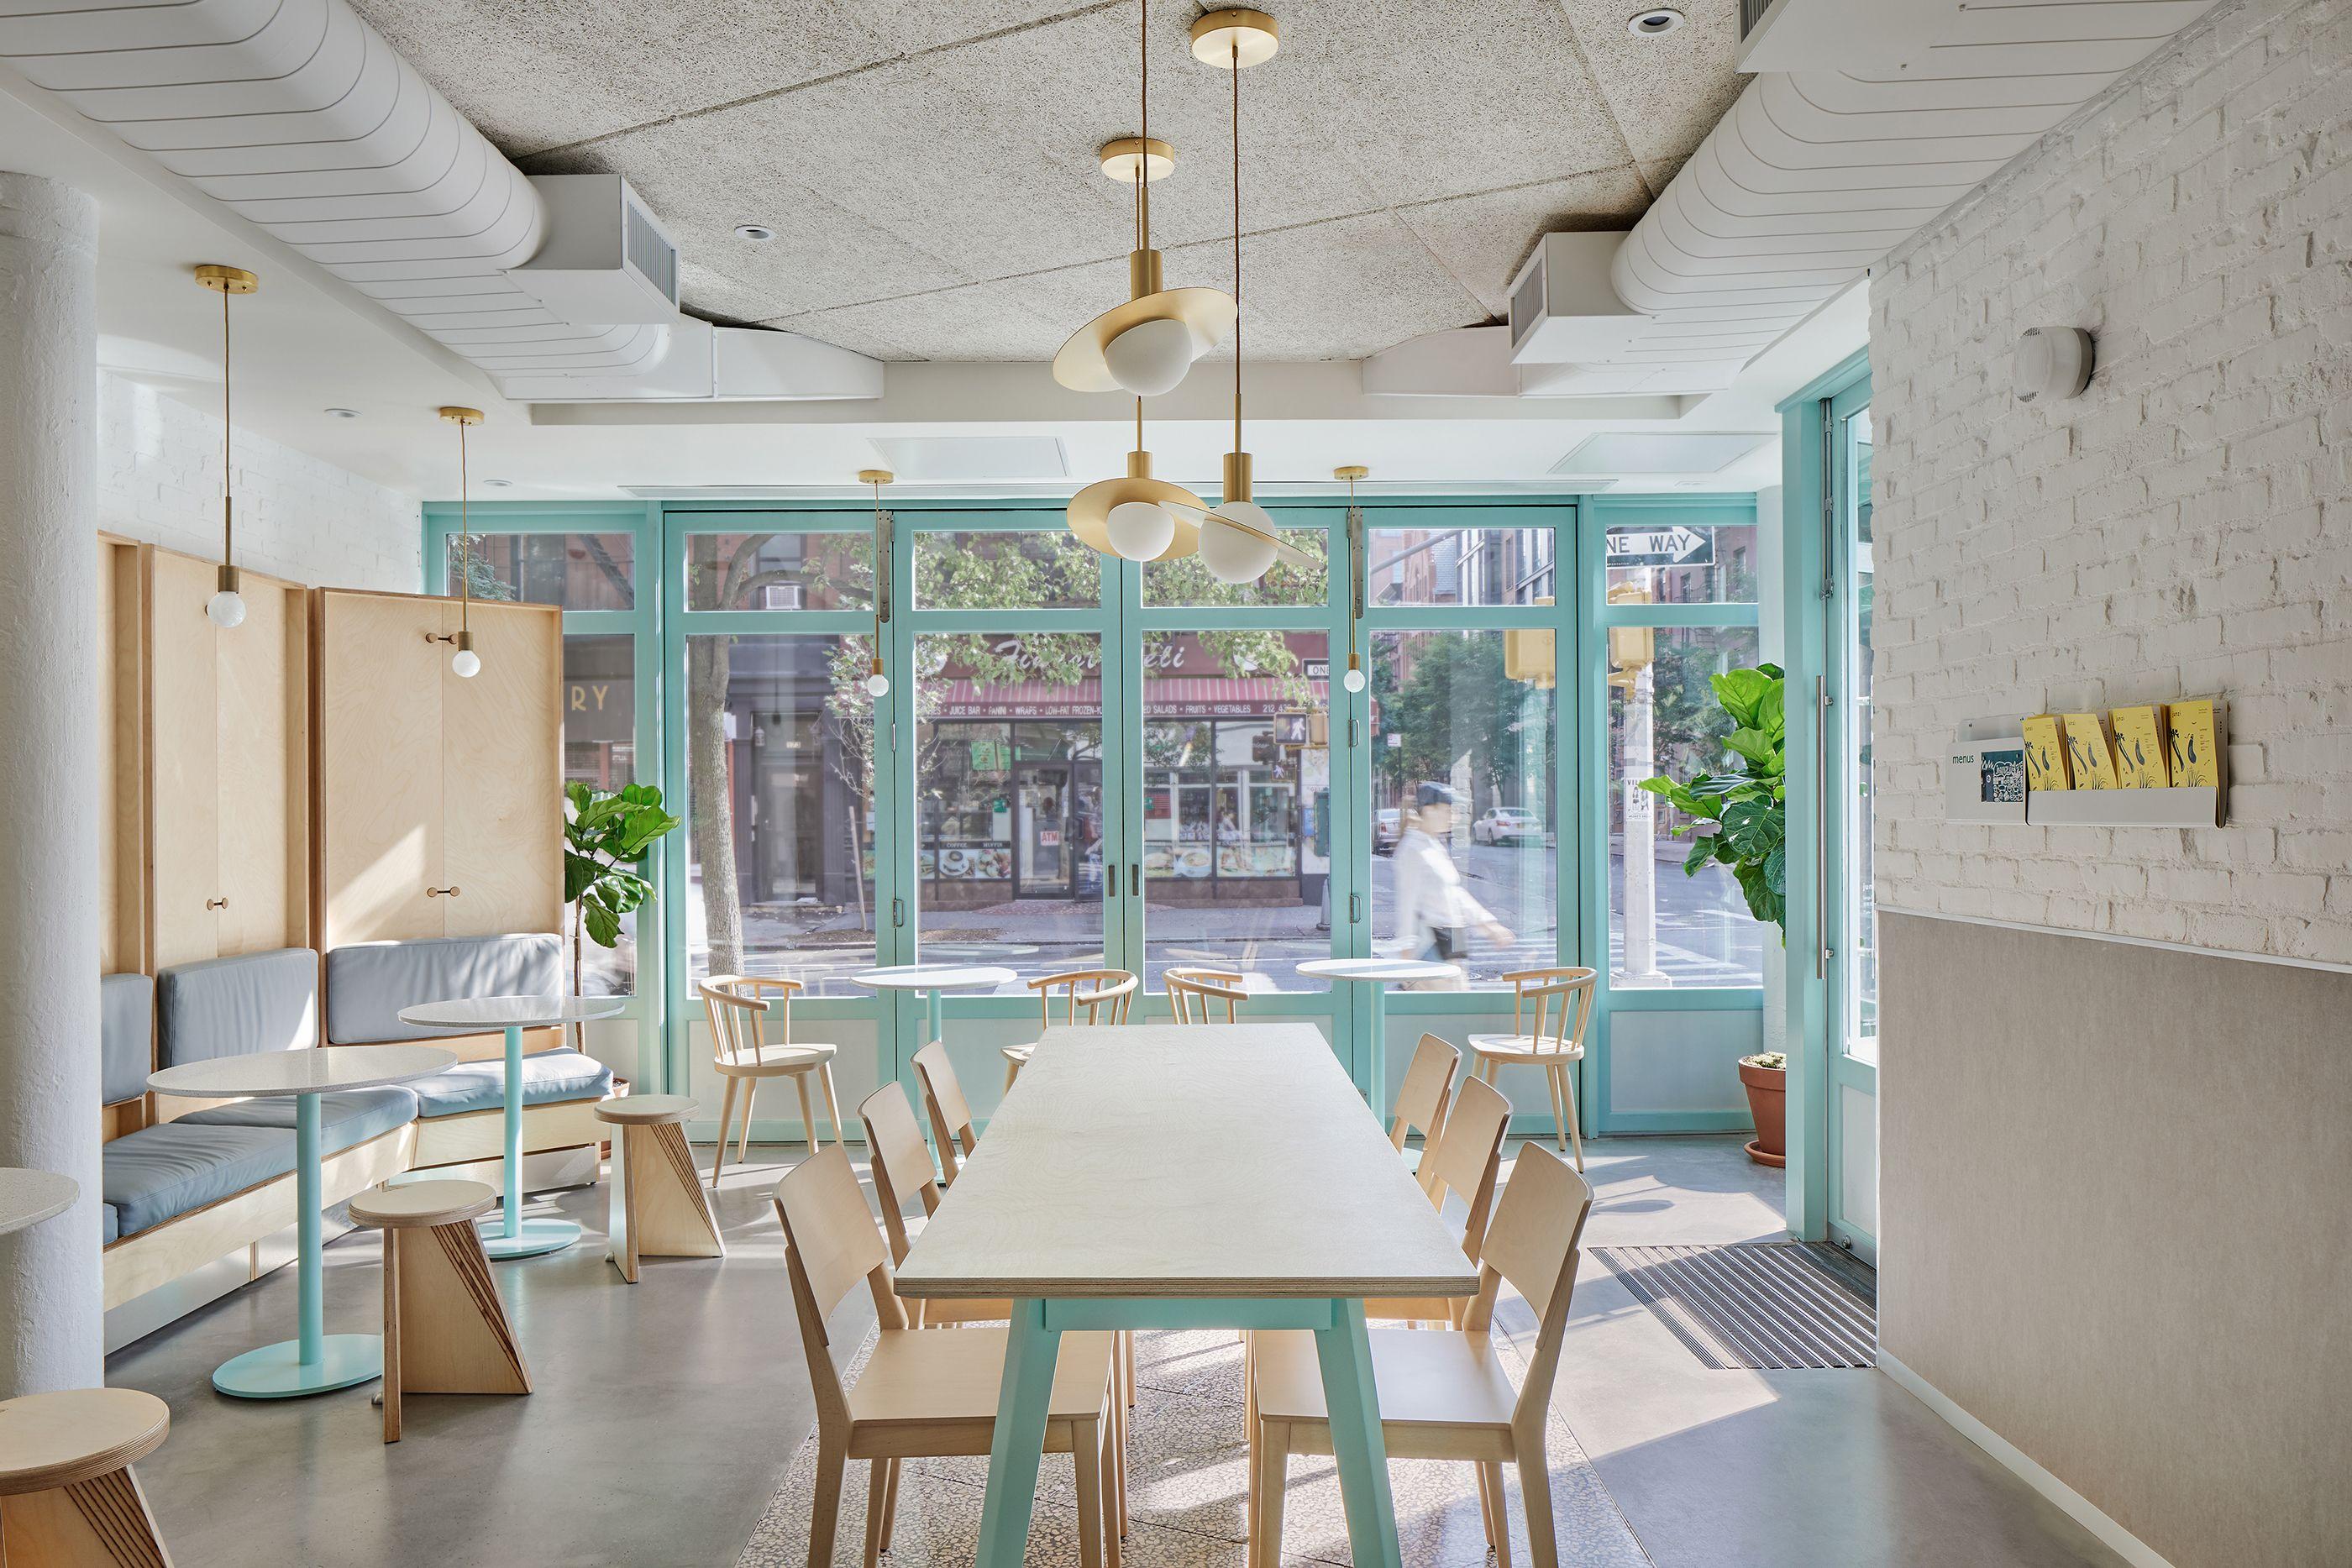 New York S Junzi Kitchen Serves Chinese Food And